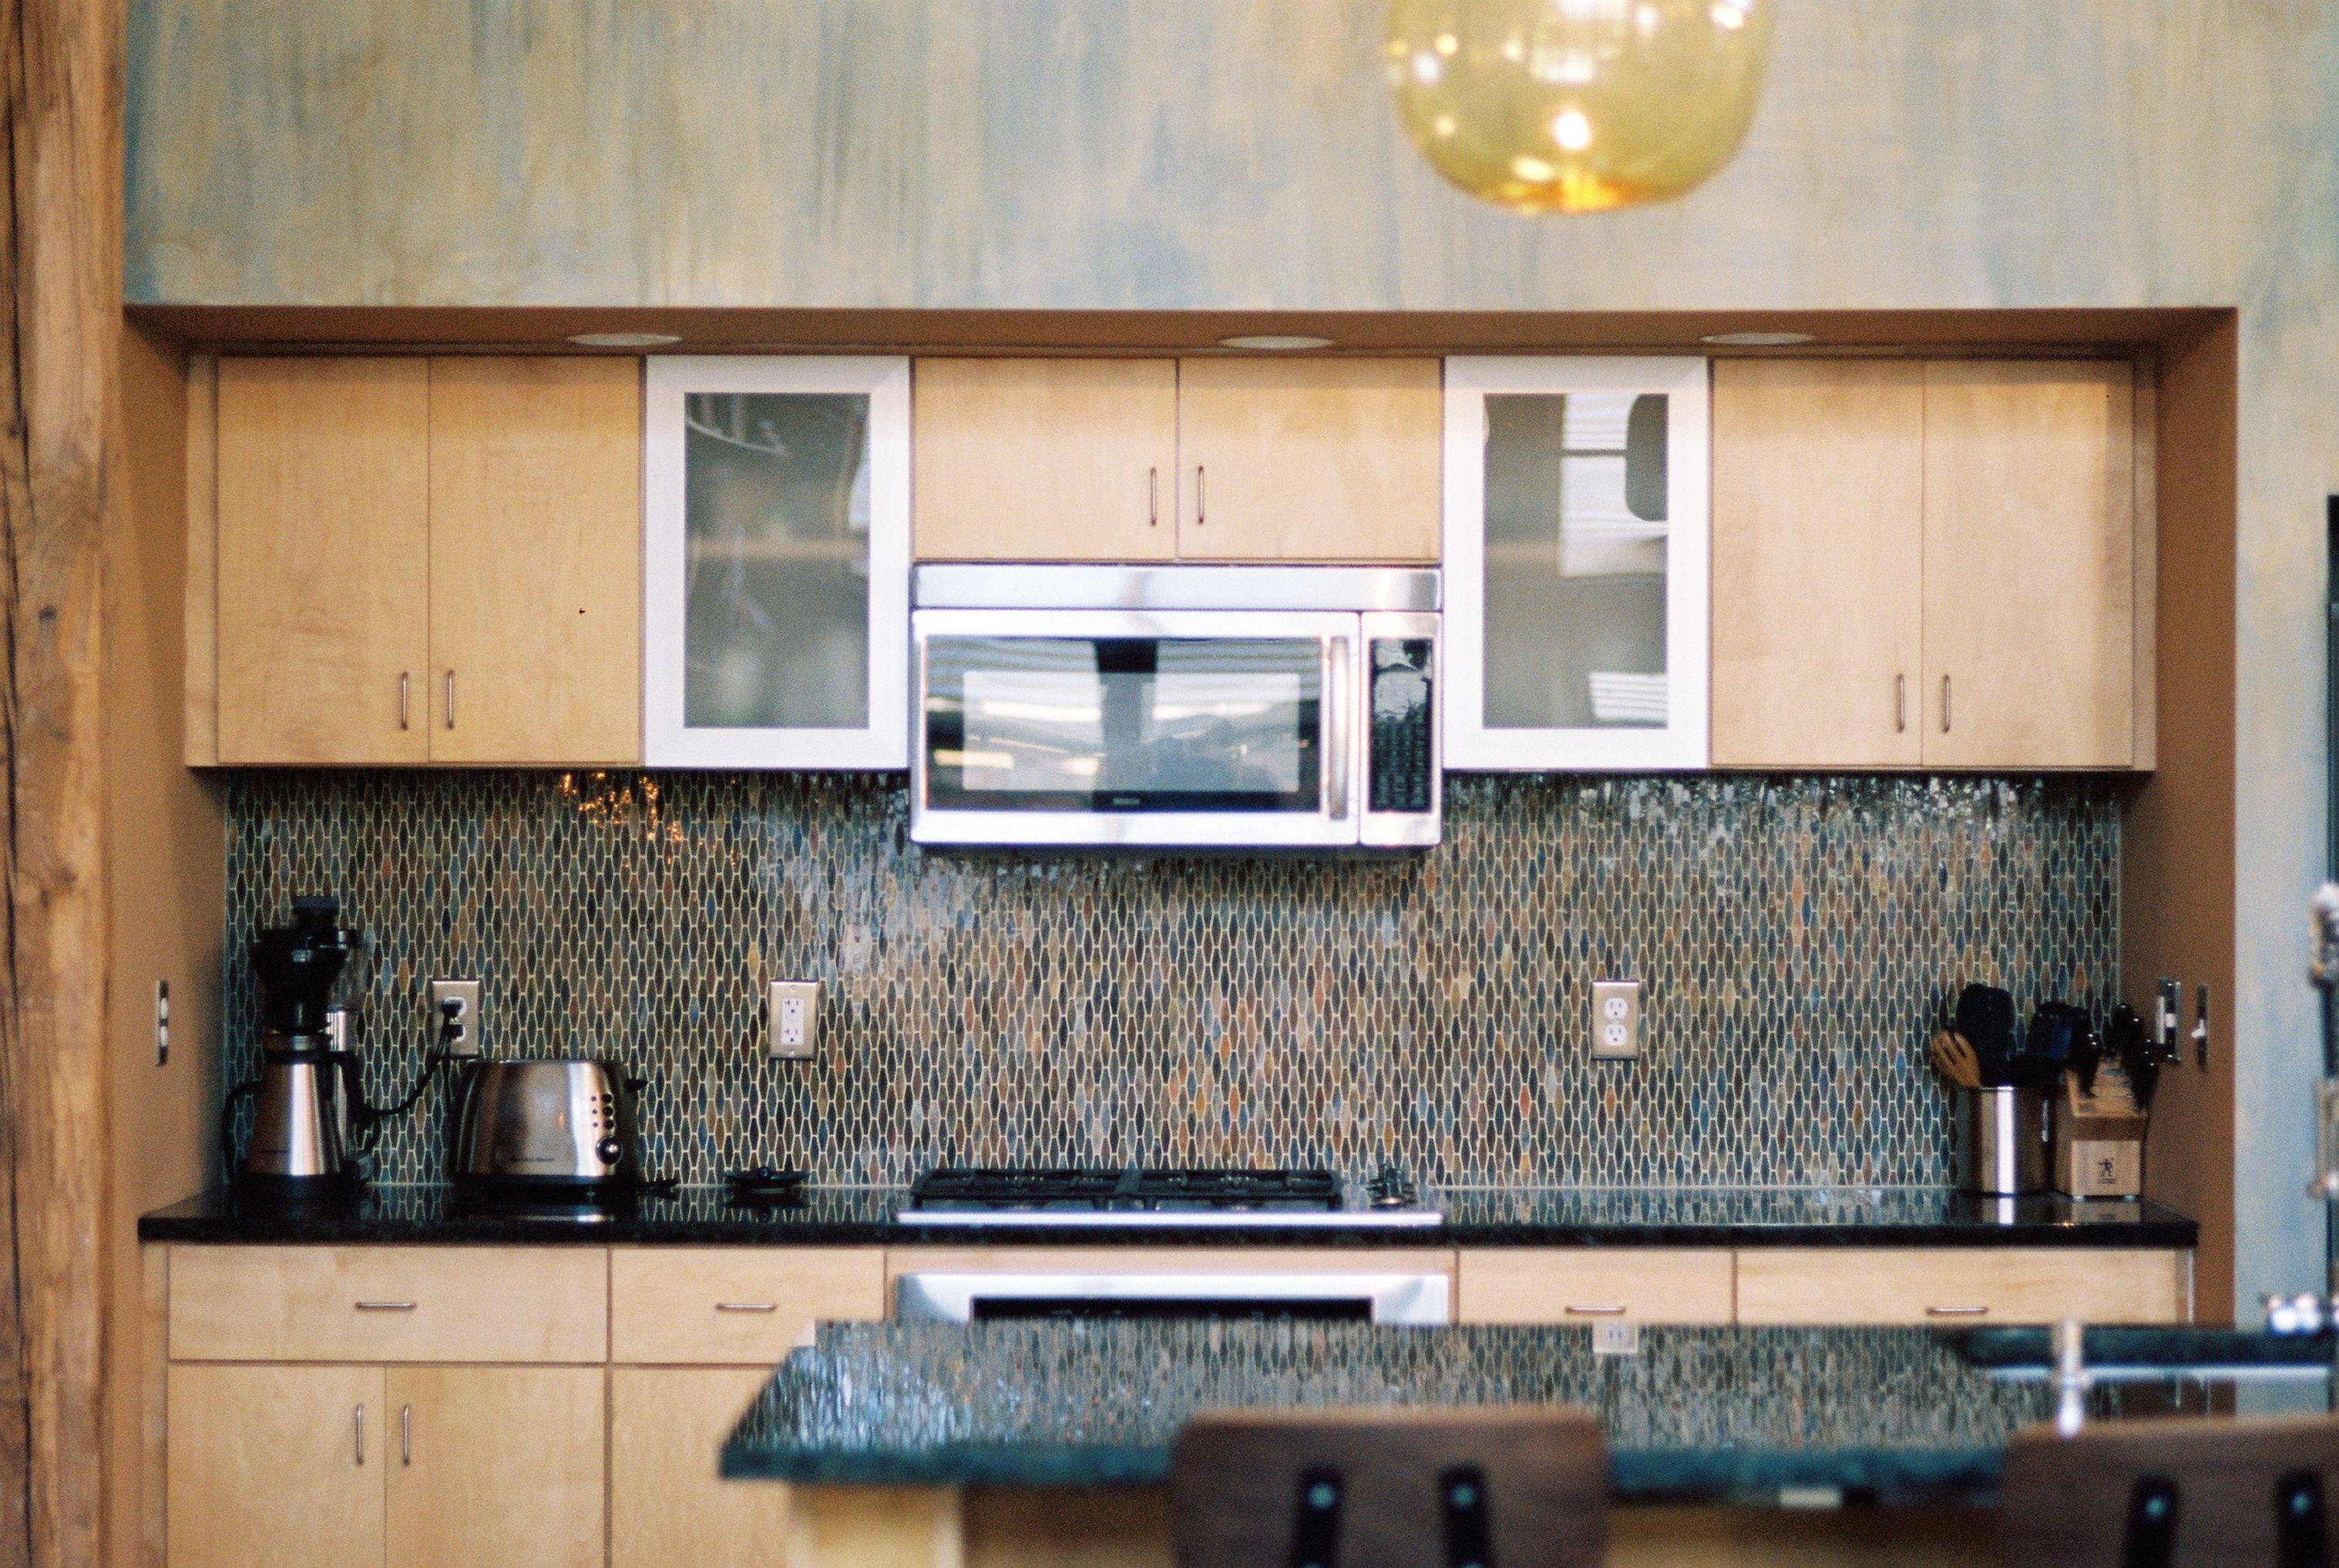 Simple modern kitchen with glass backsplash lava stone counters